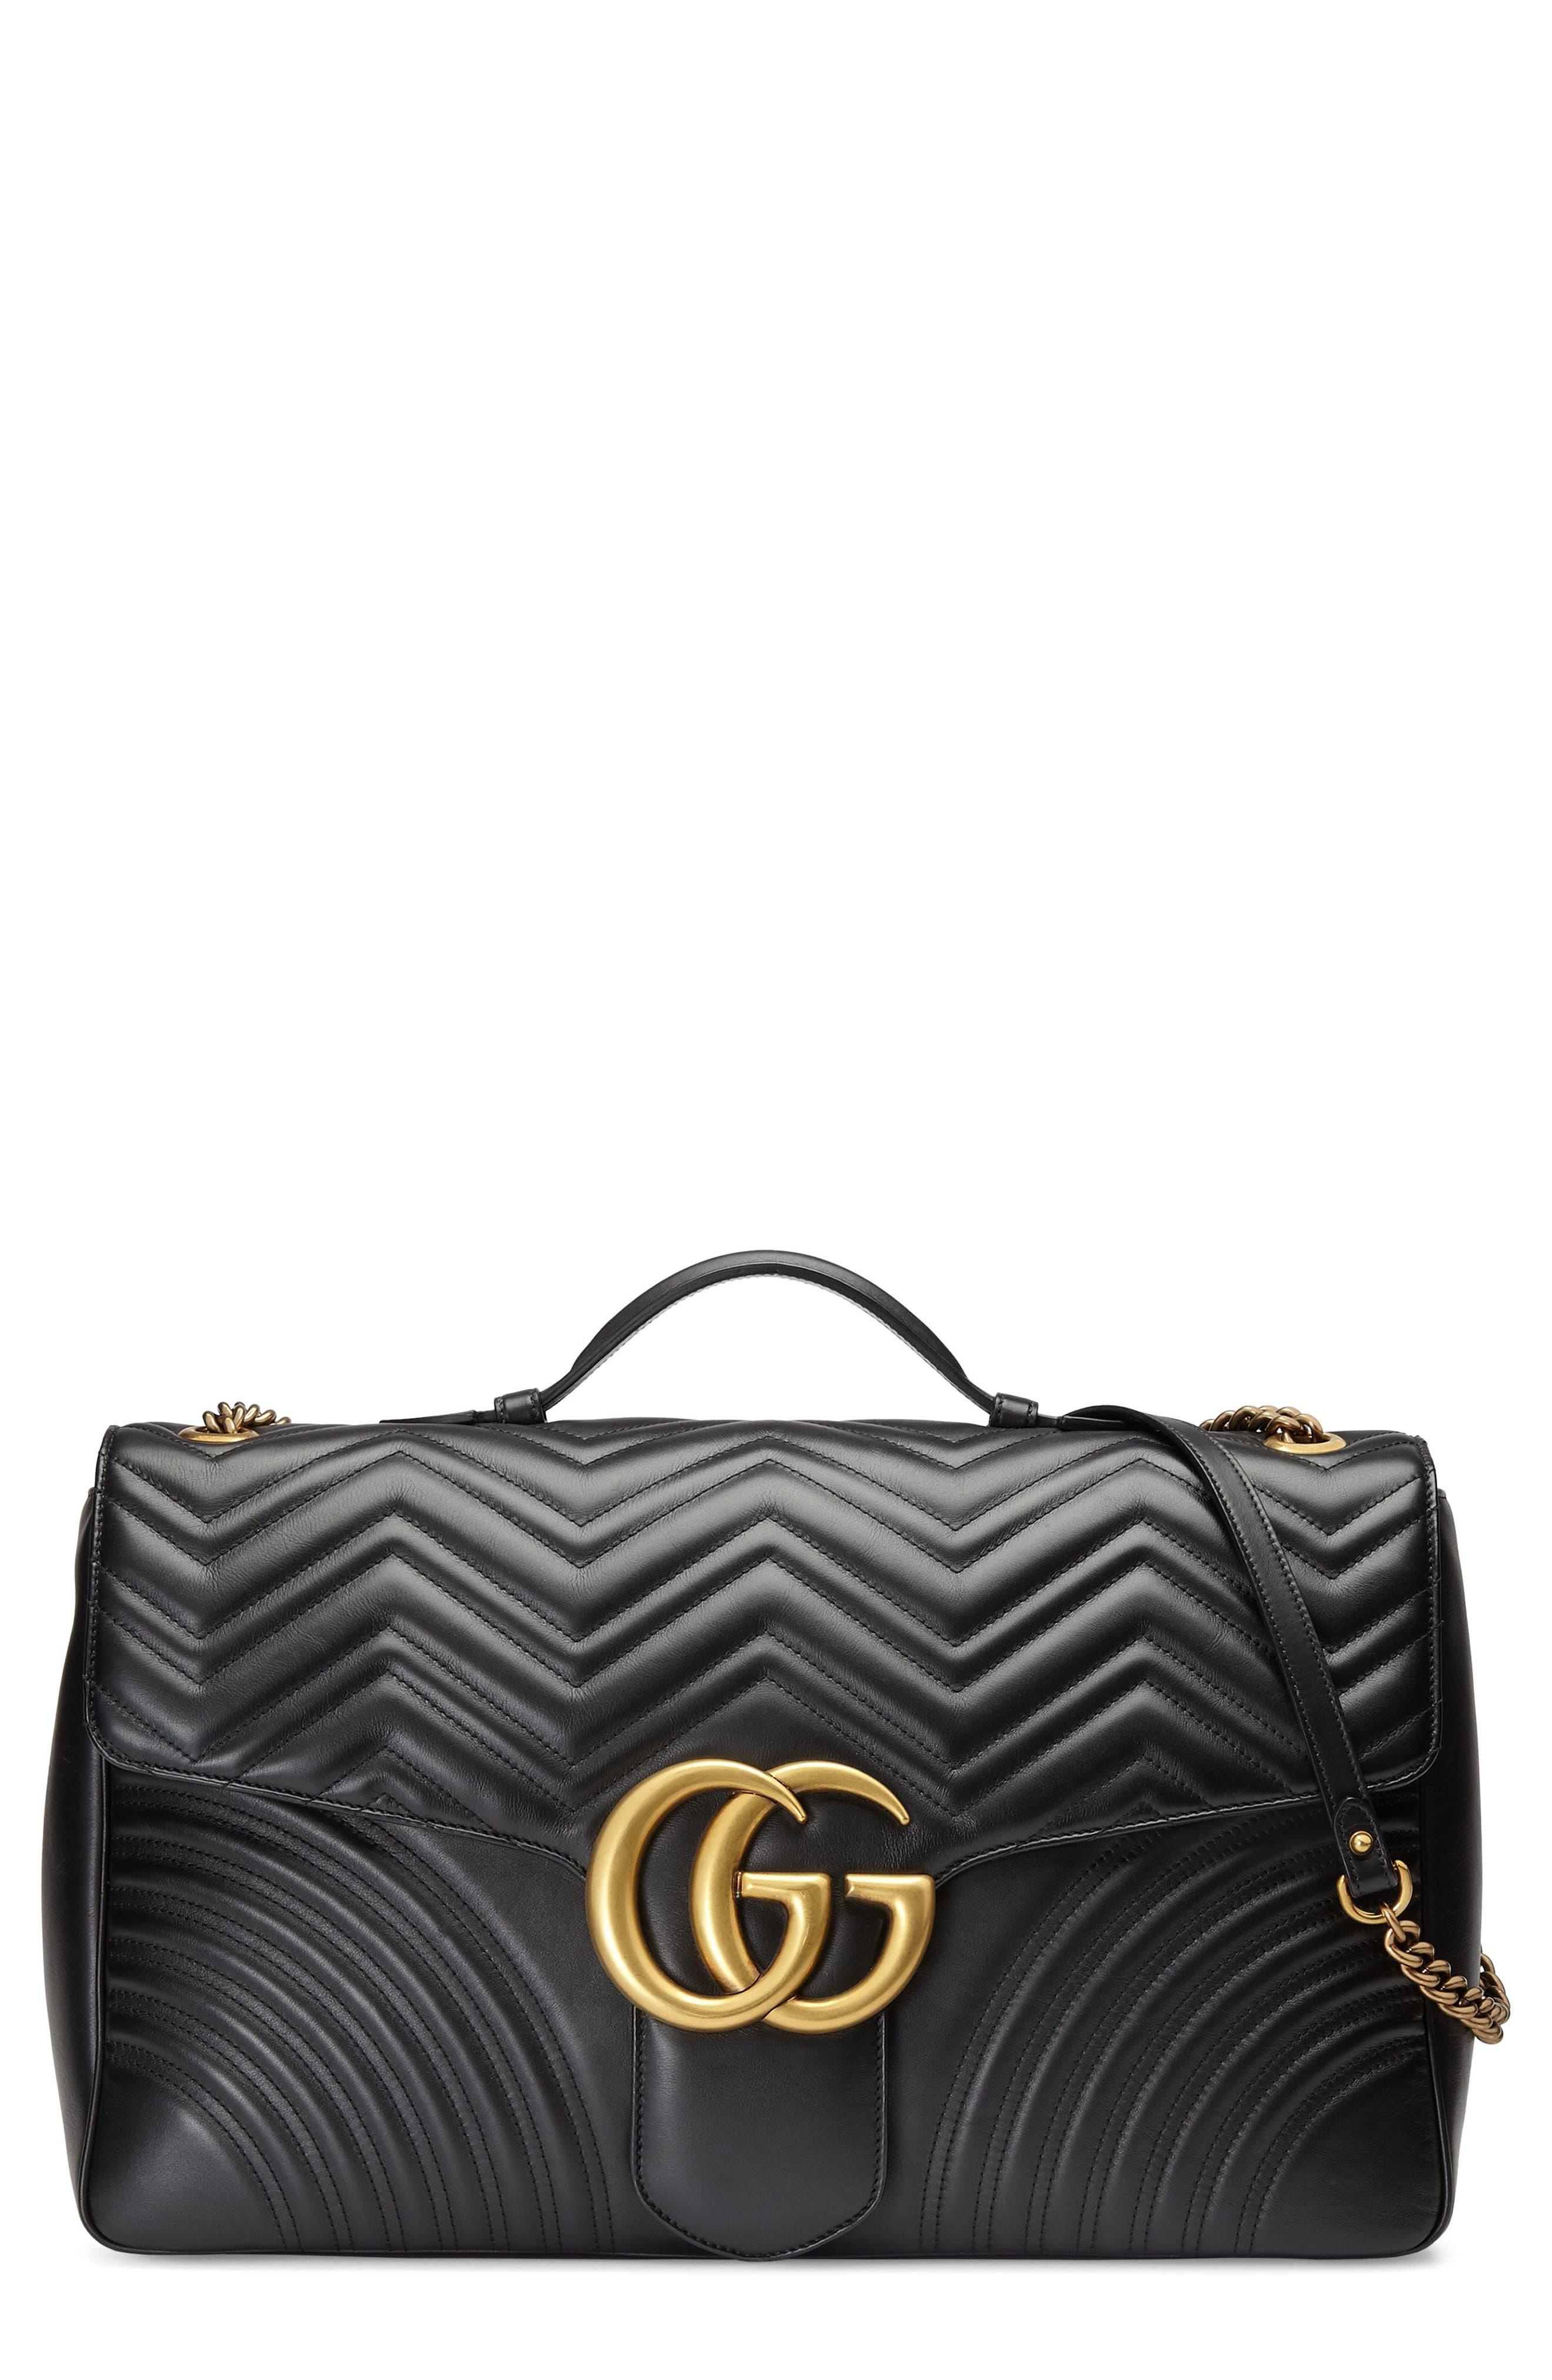 GG Marmont Maxi Matelassé Top Handle Shoulder Bag,                             Main thumbnail 1, color,                             Nero